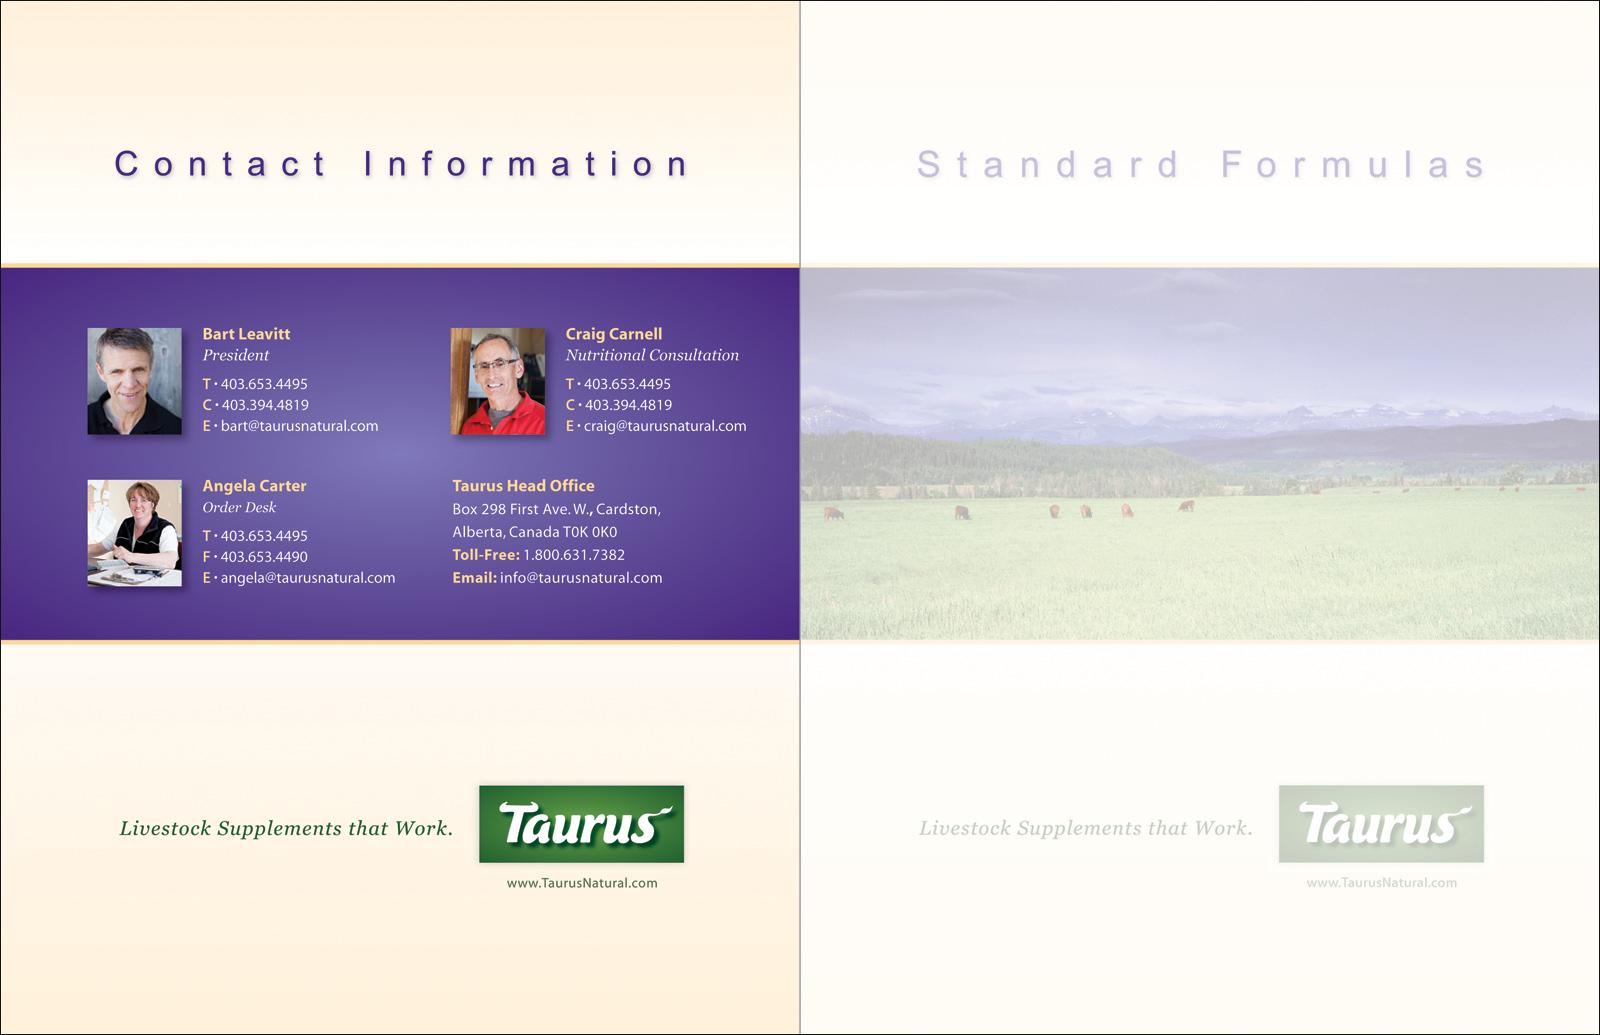 TaurusBrochureSpreads-4.jpg